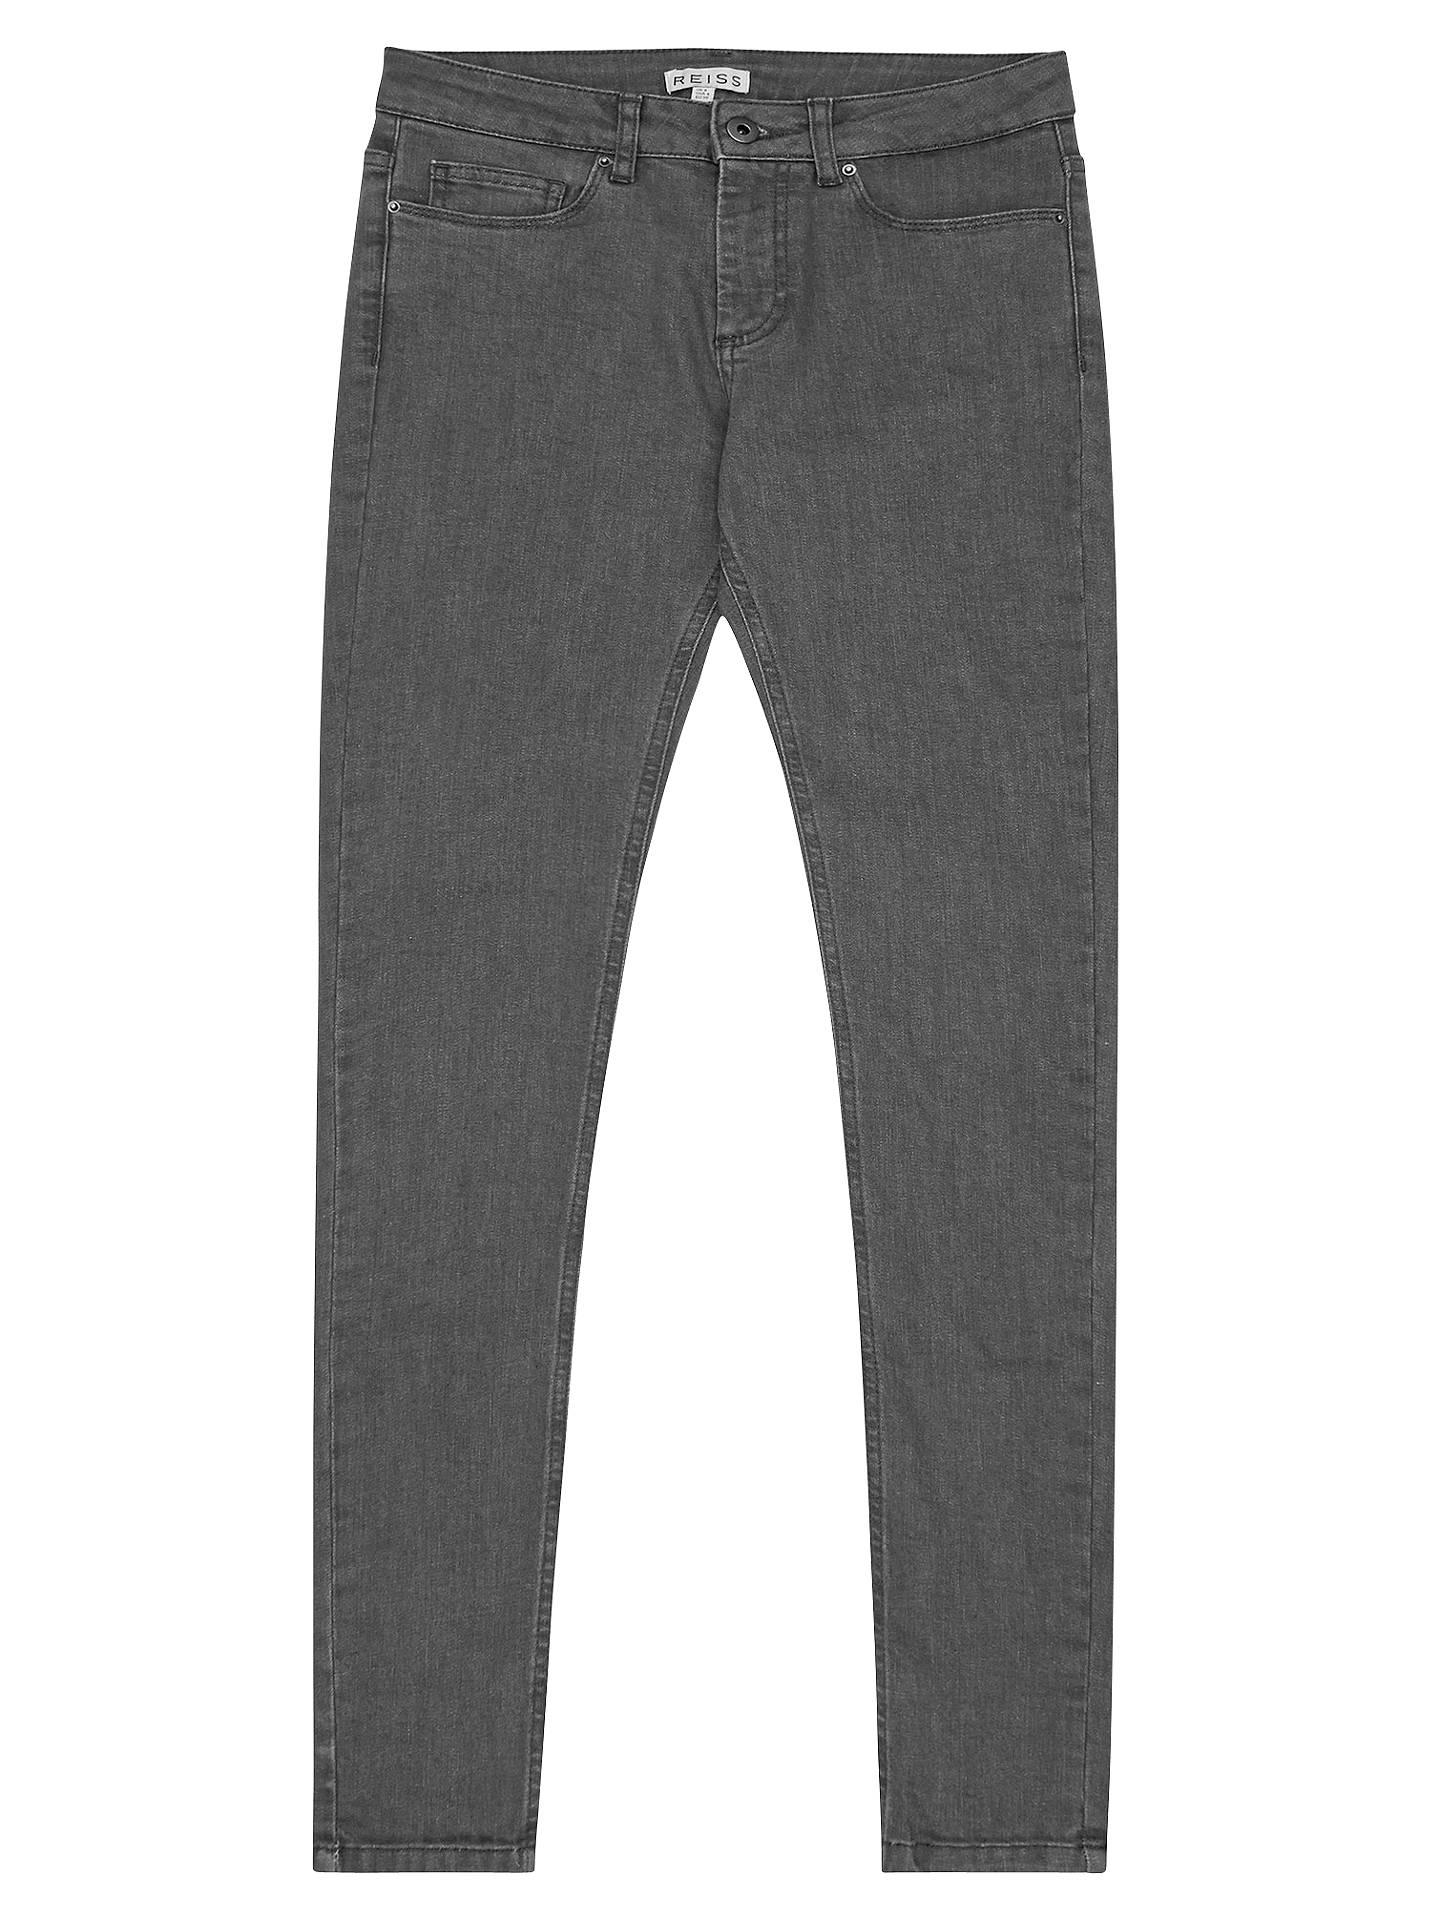 Reiss Jeans Jeans Men's Clothing